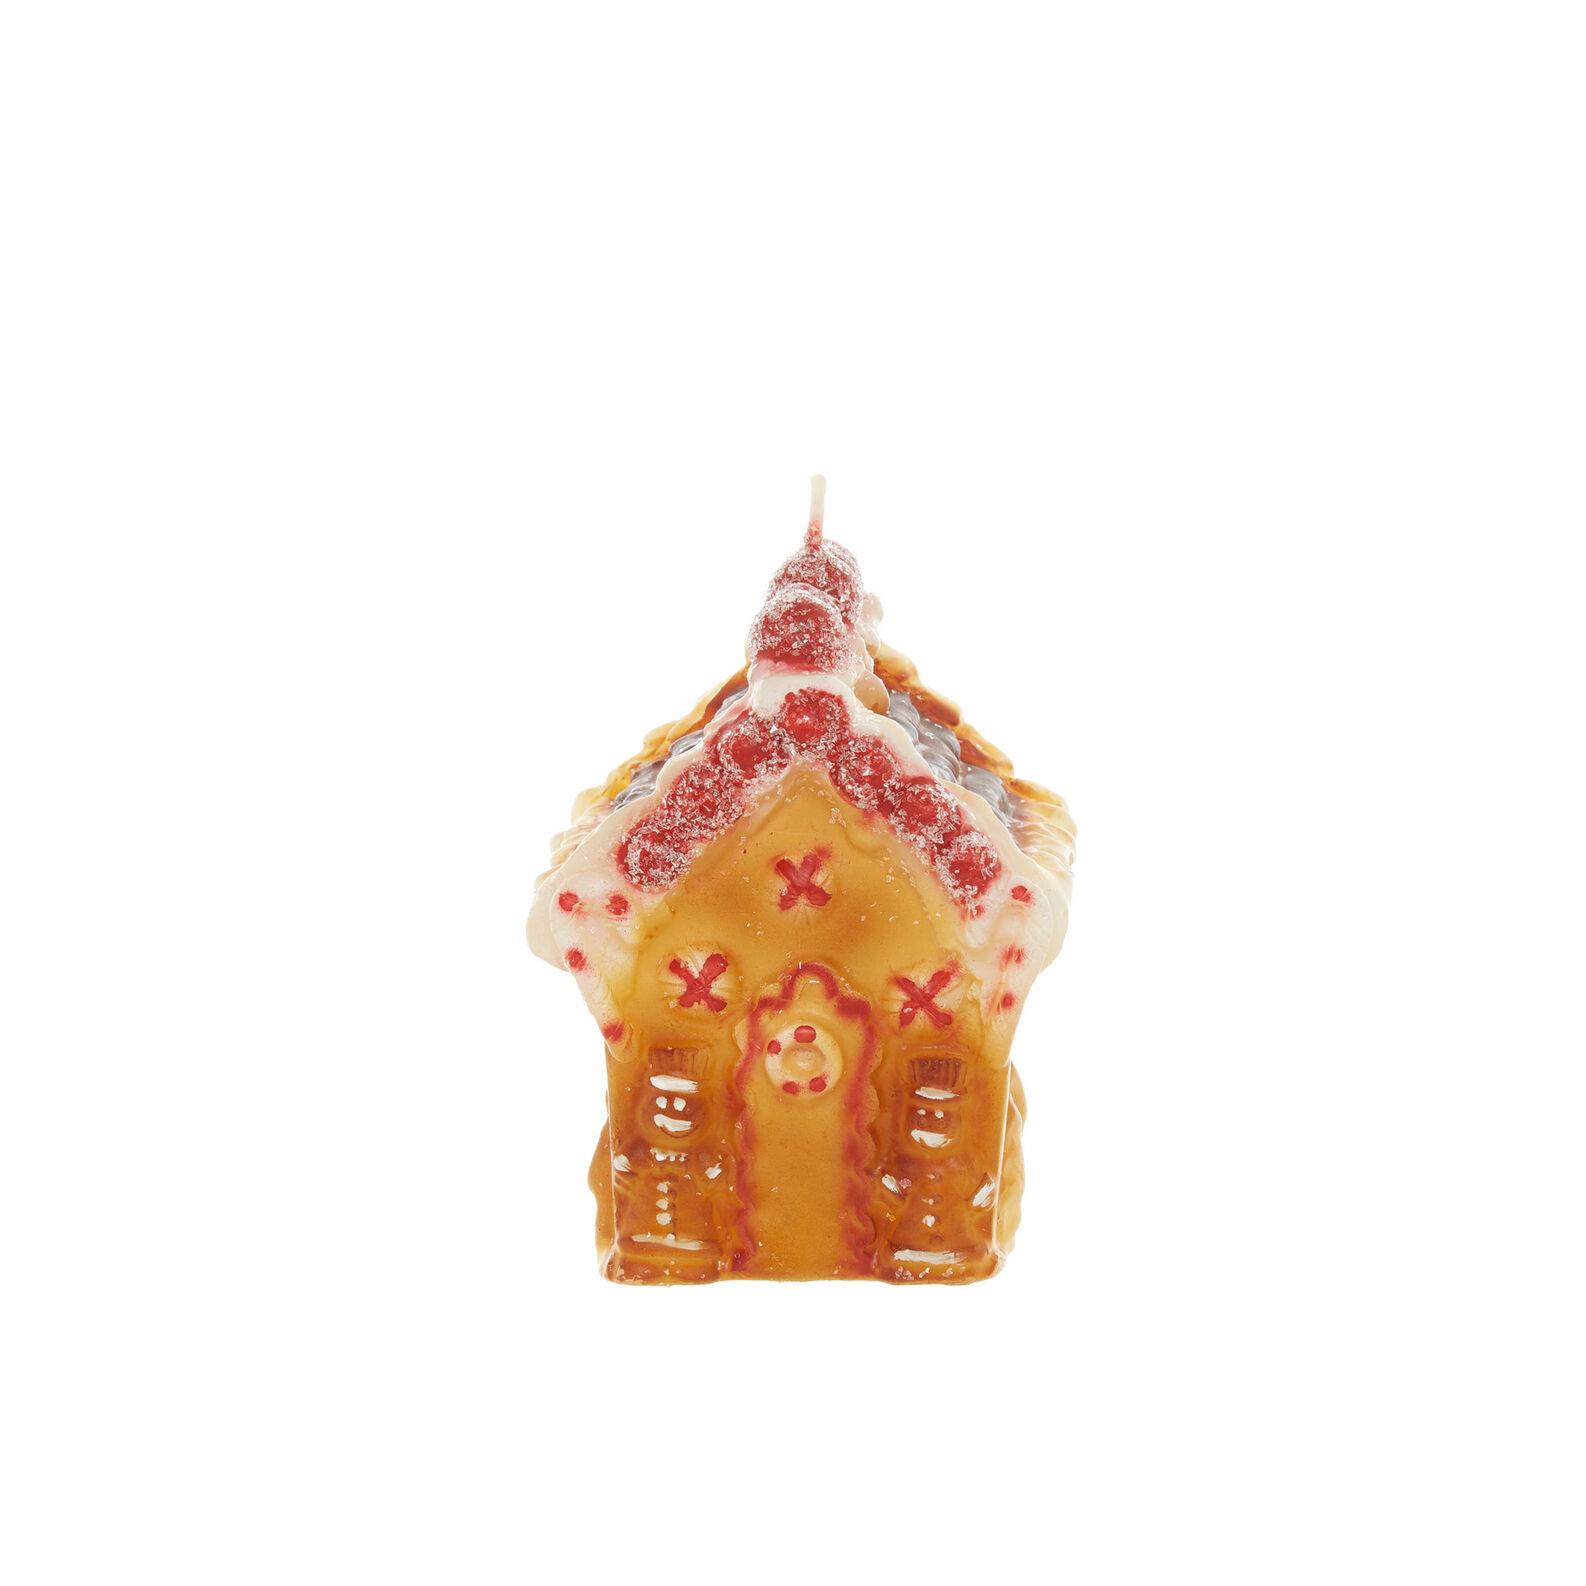 Handmade house candle